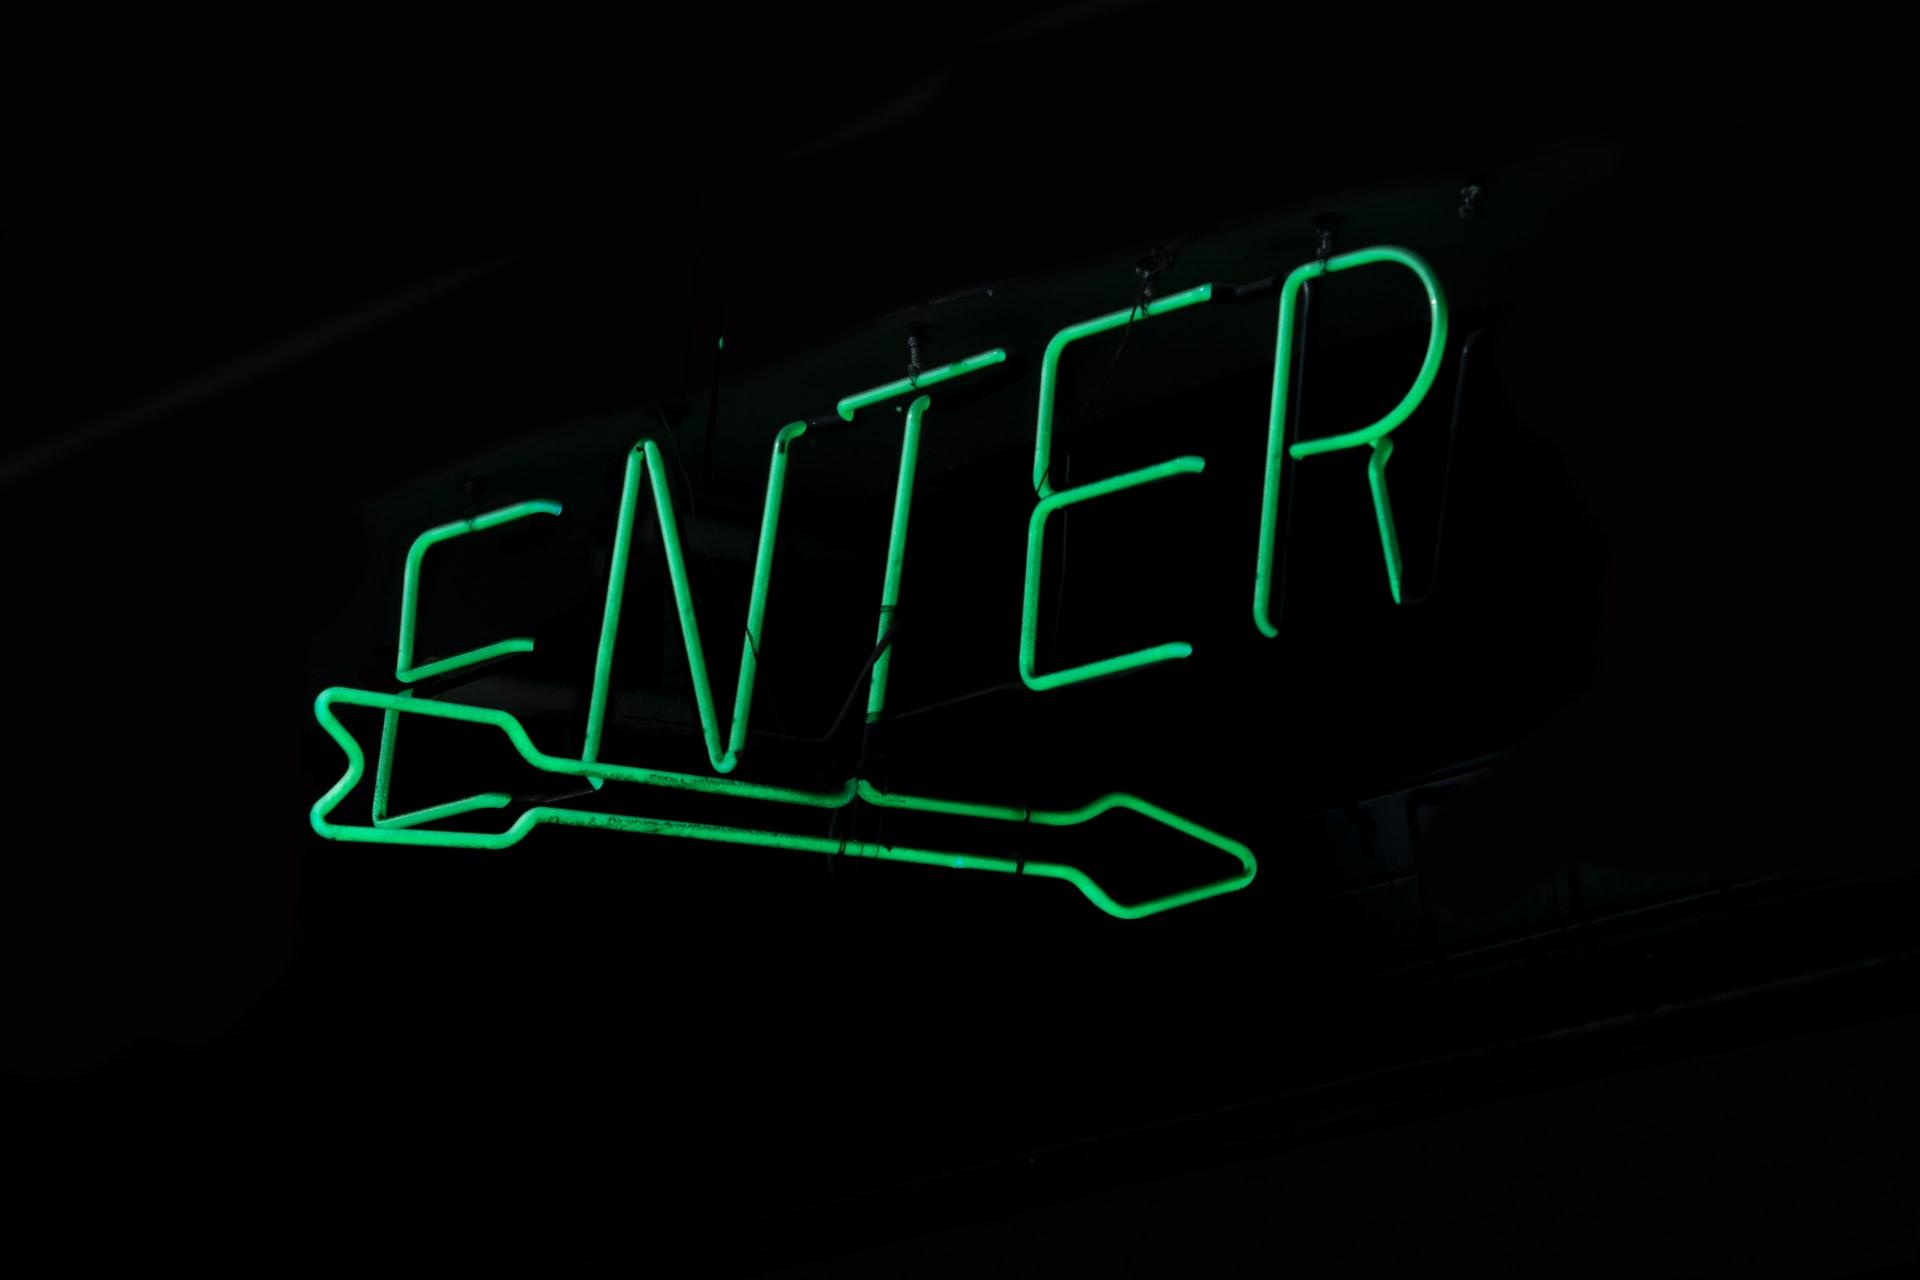 """Enter"" sign Photo by Jude Beck on Unsplash"